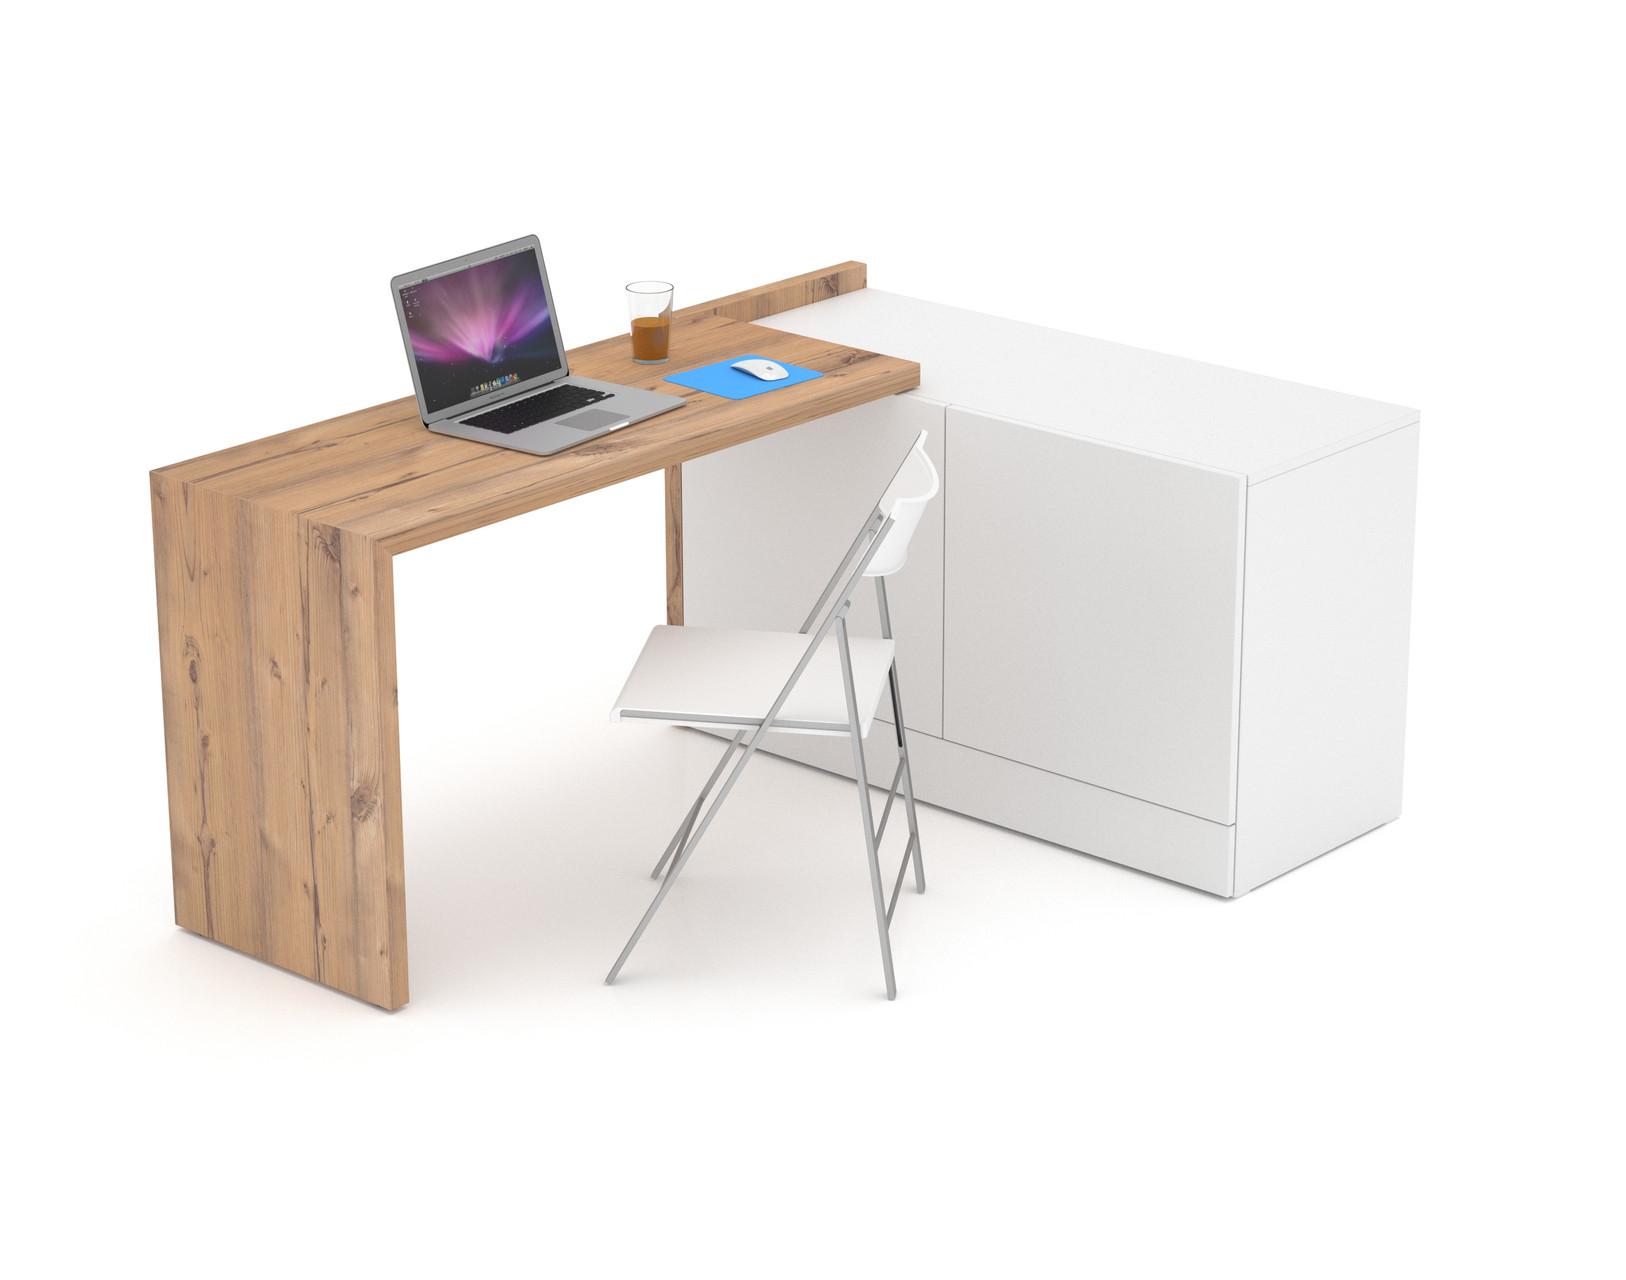 Startseite - Multifunktionsmöbel